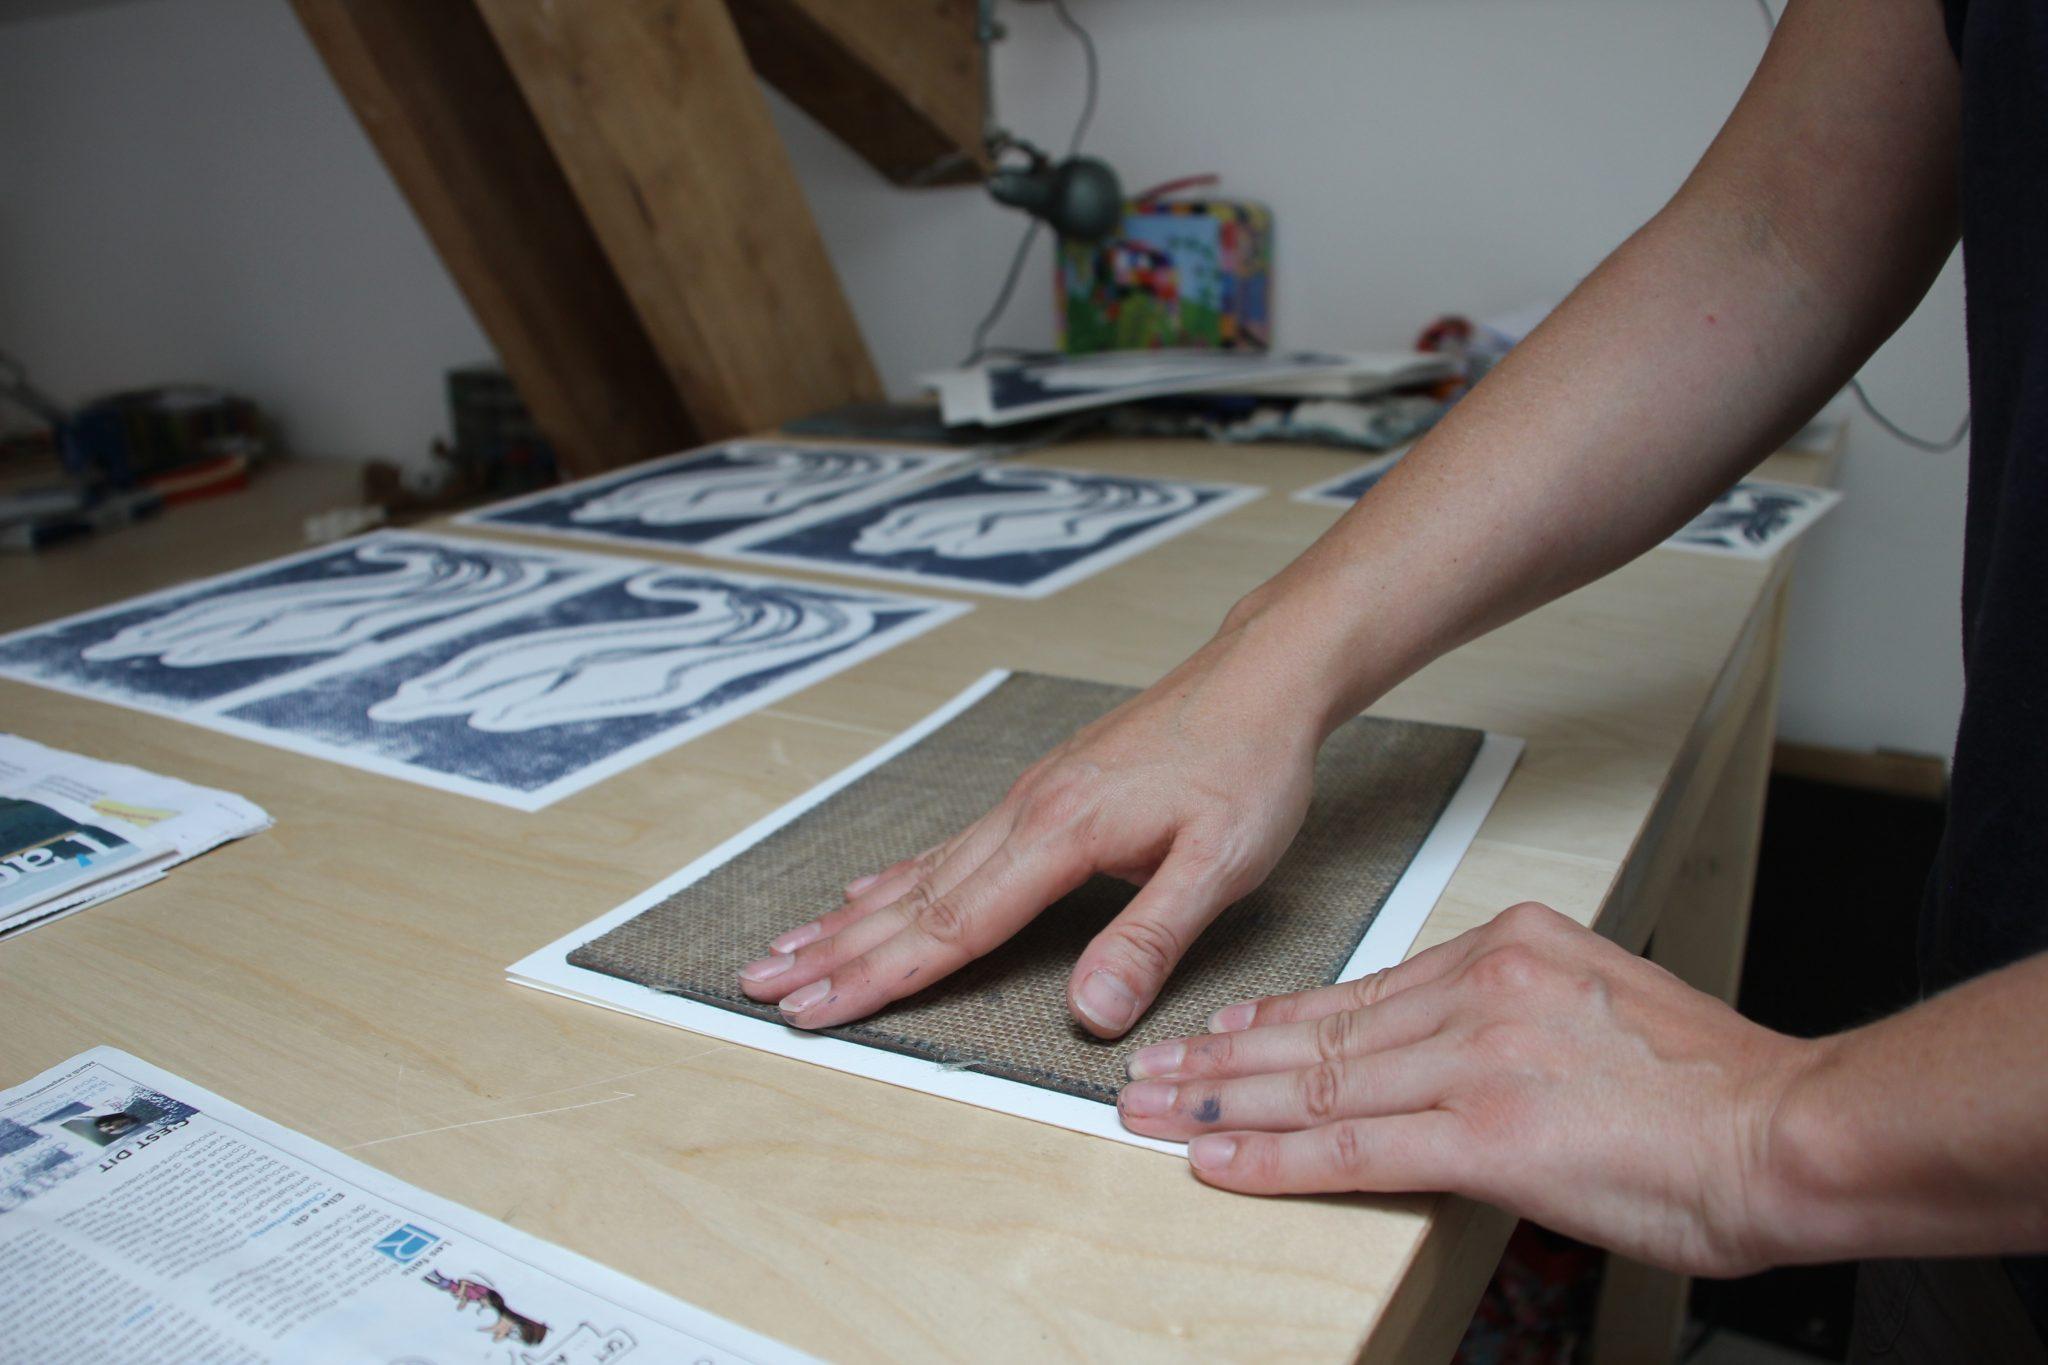 Azilise de LinoLino au travail (impression) | LinoLino | Linogravure | Créations artisanales